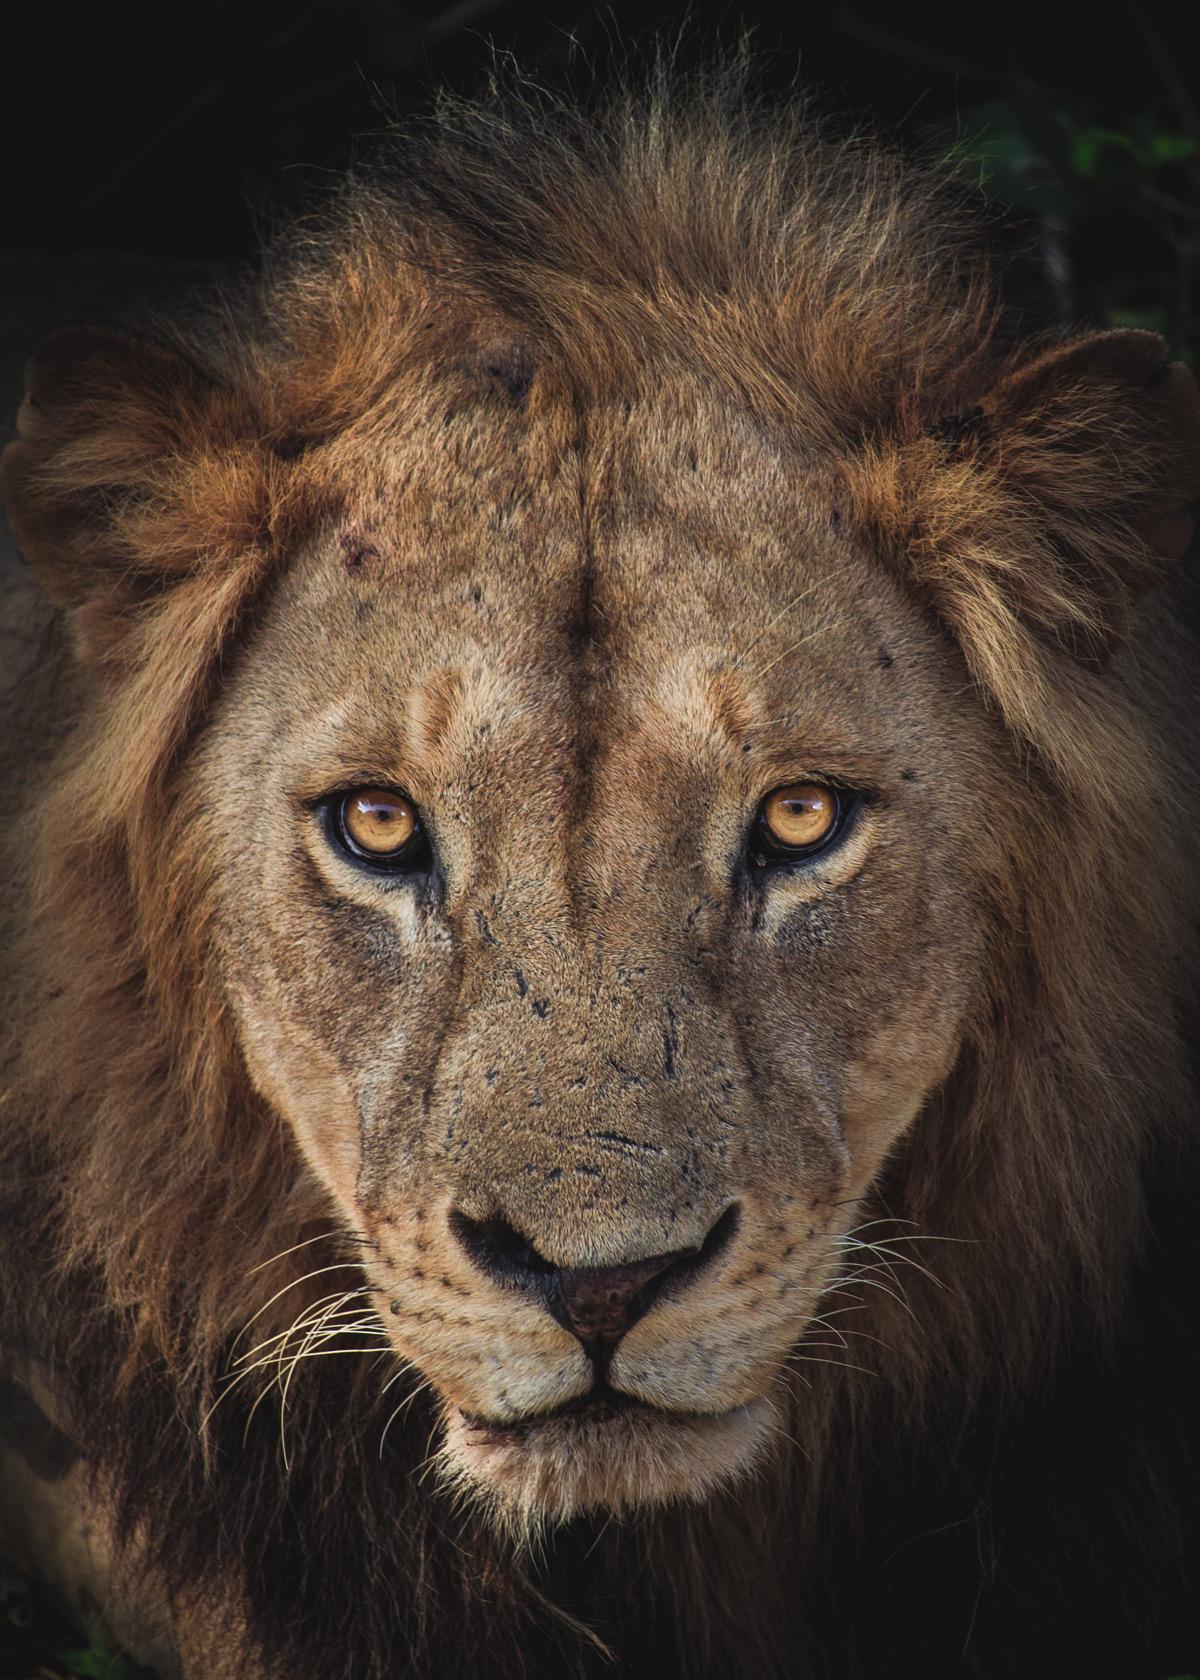 A lion spotted along the road in Lake Manyara National Park, Tanzania © Serkan Hussein